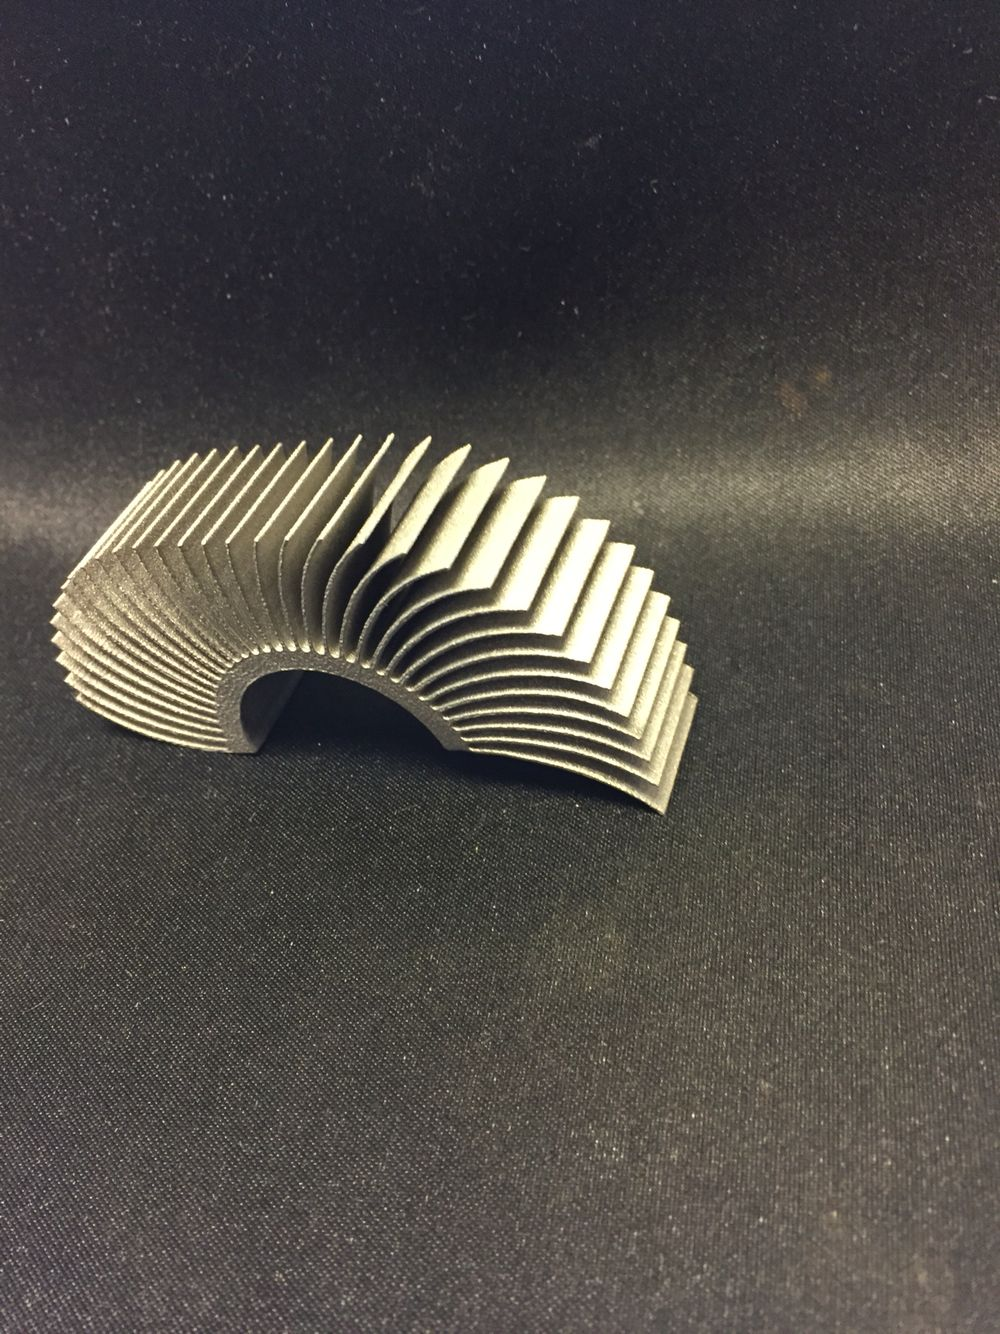 pin on metal 3d printing